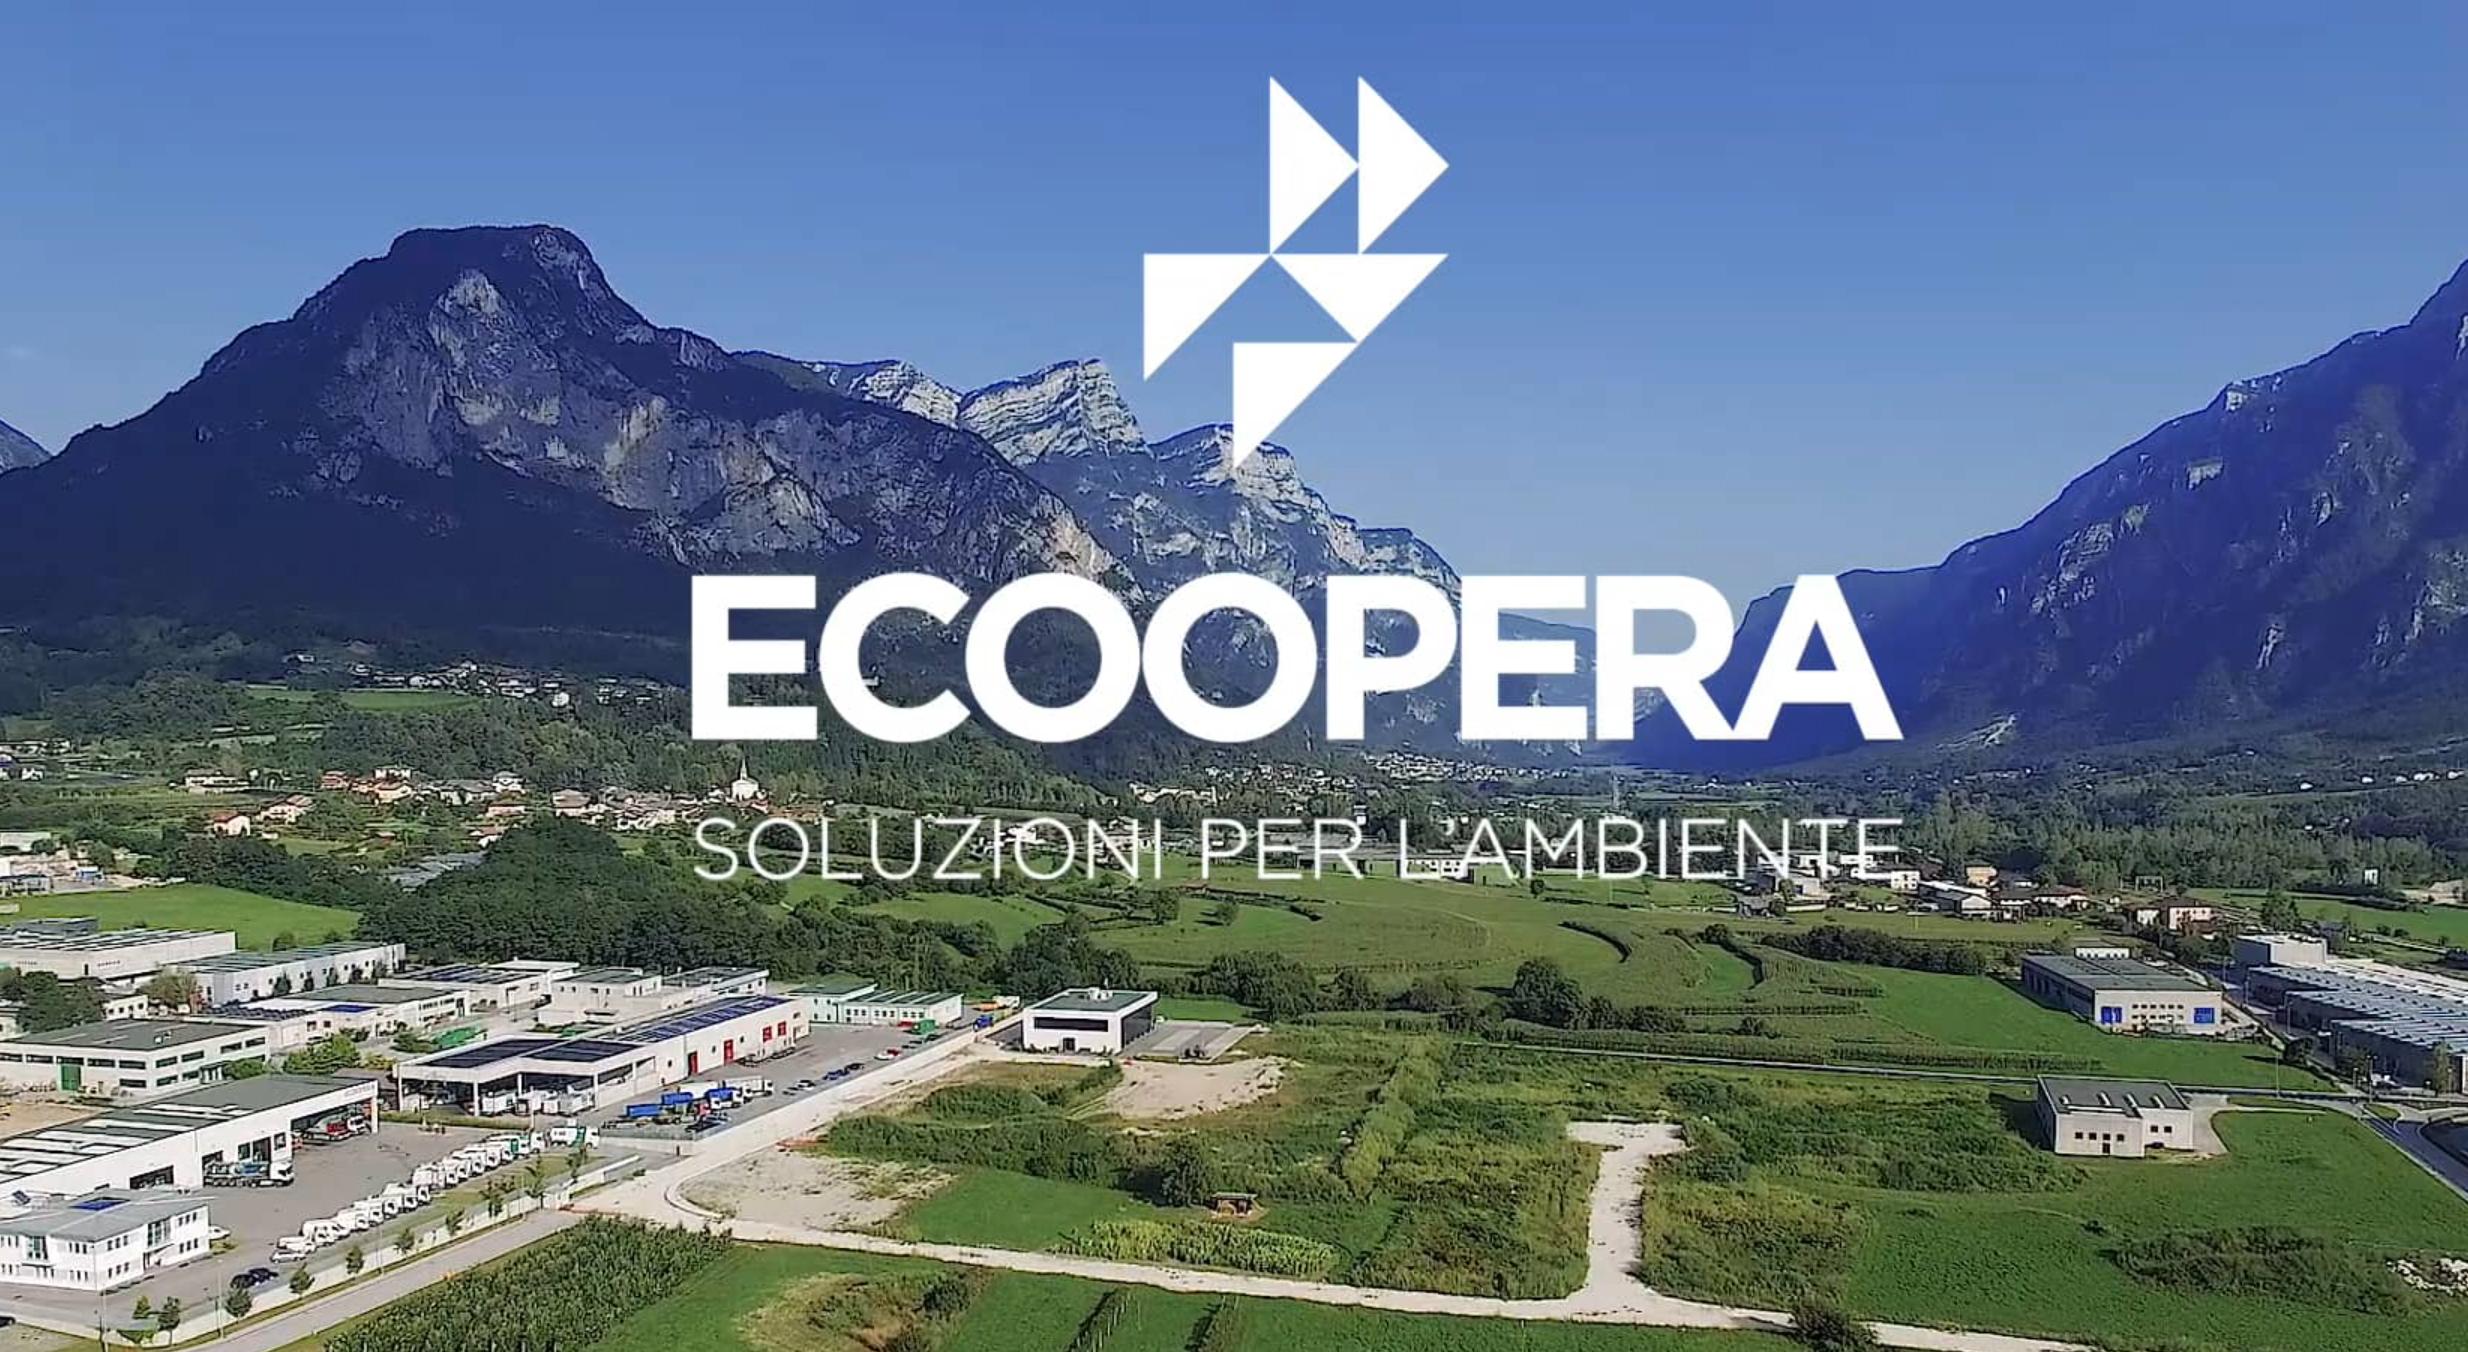 Ecoopera - Video aziendale